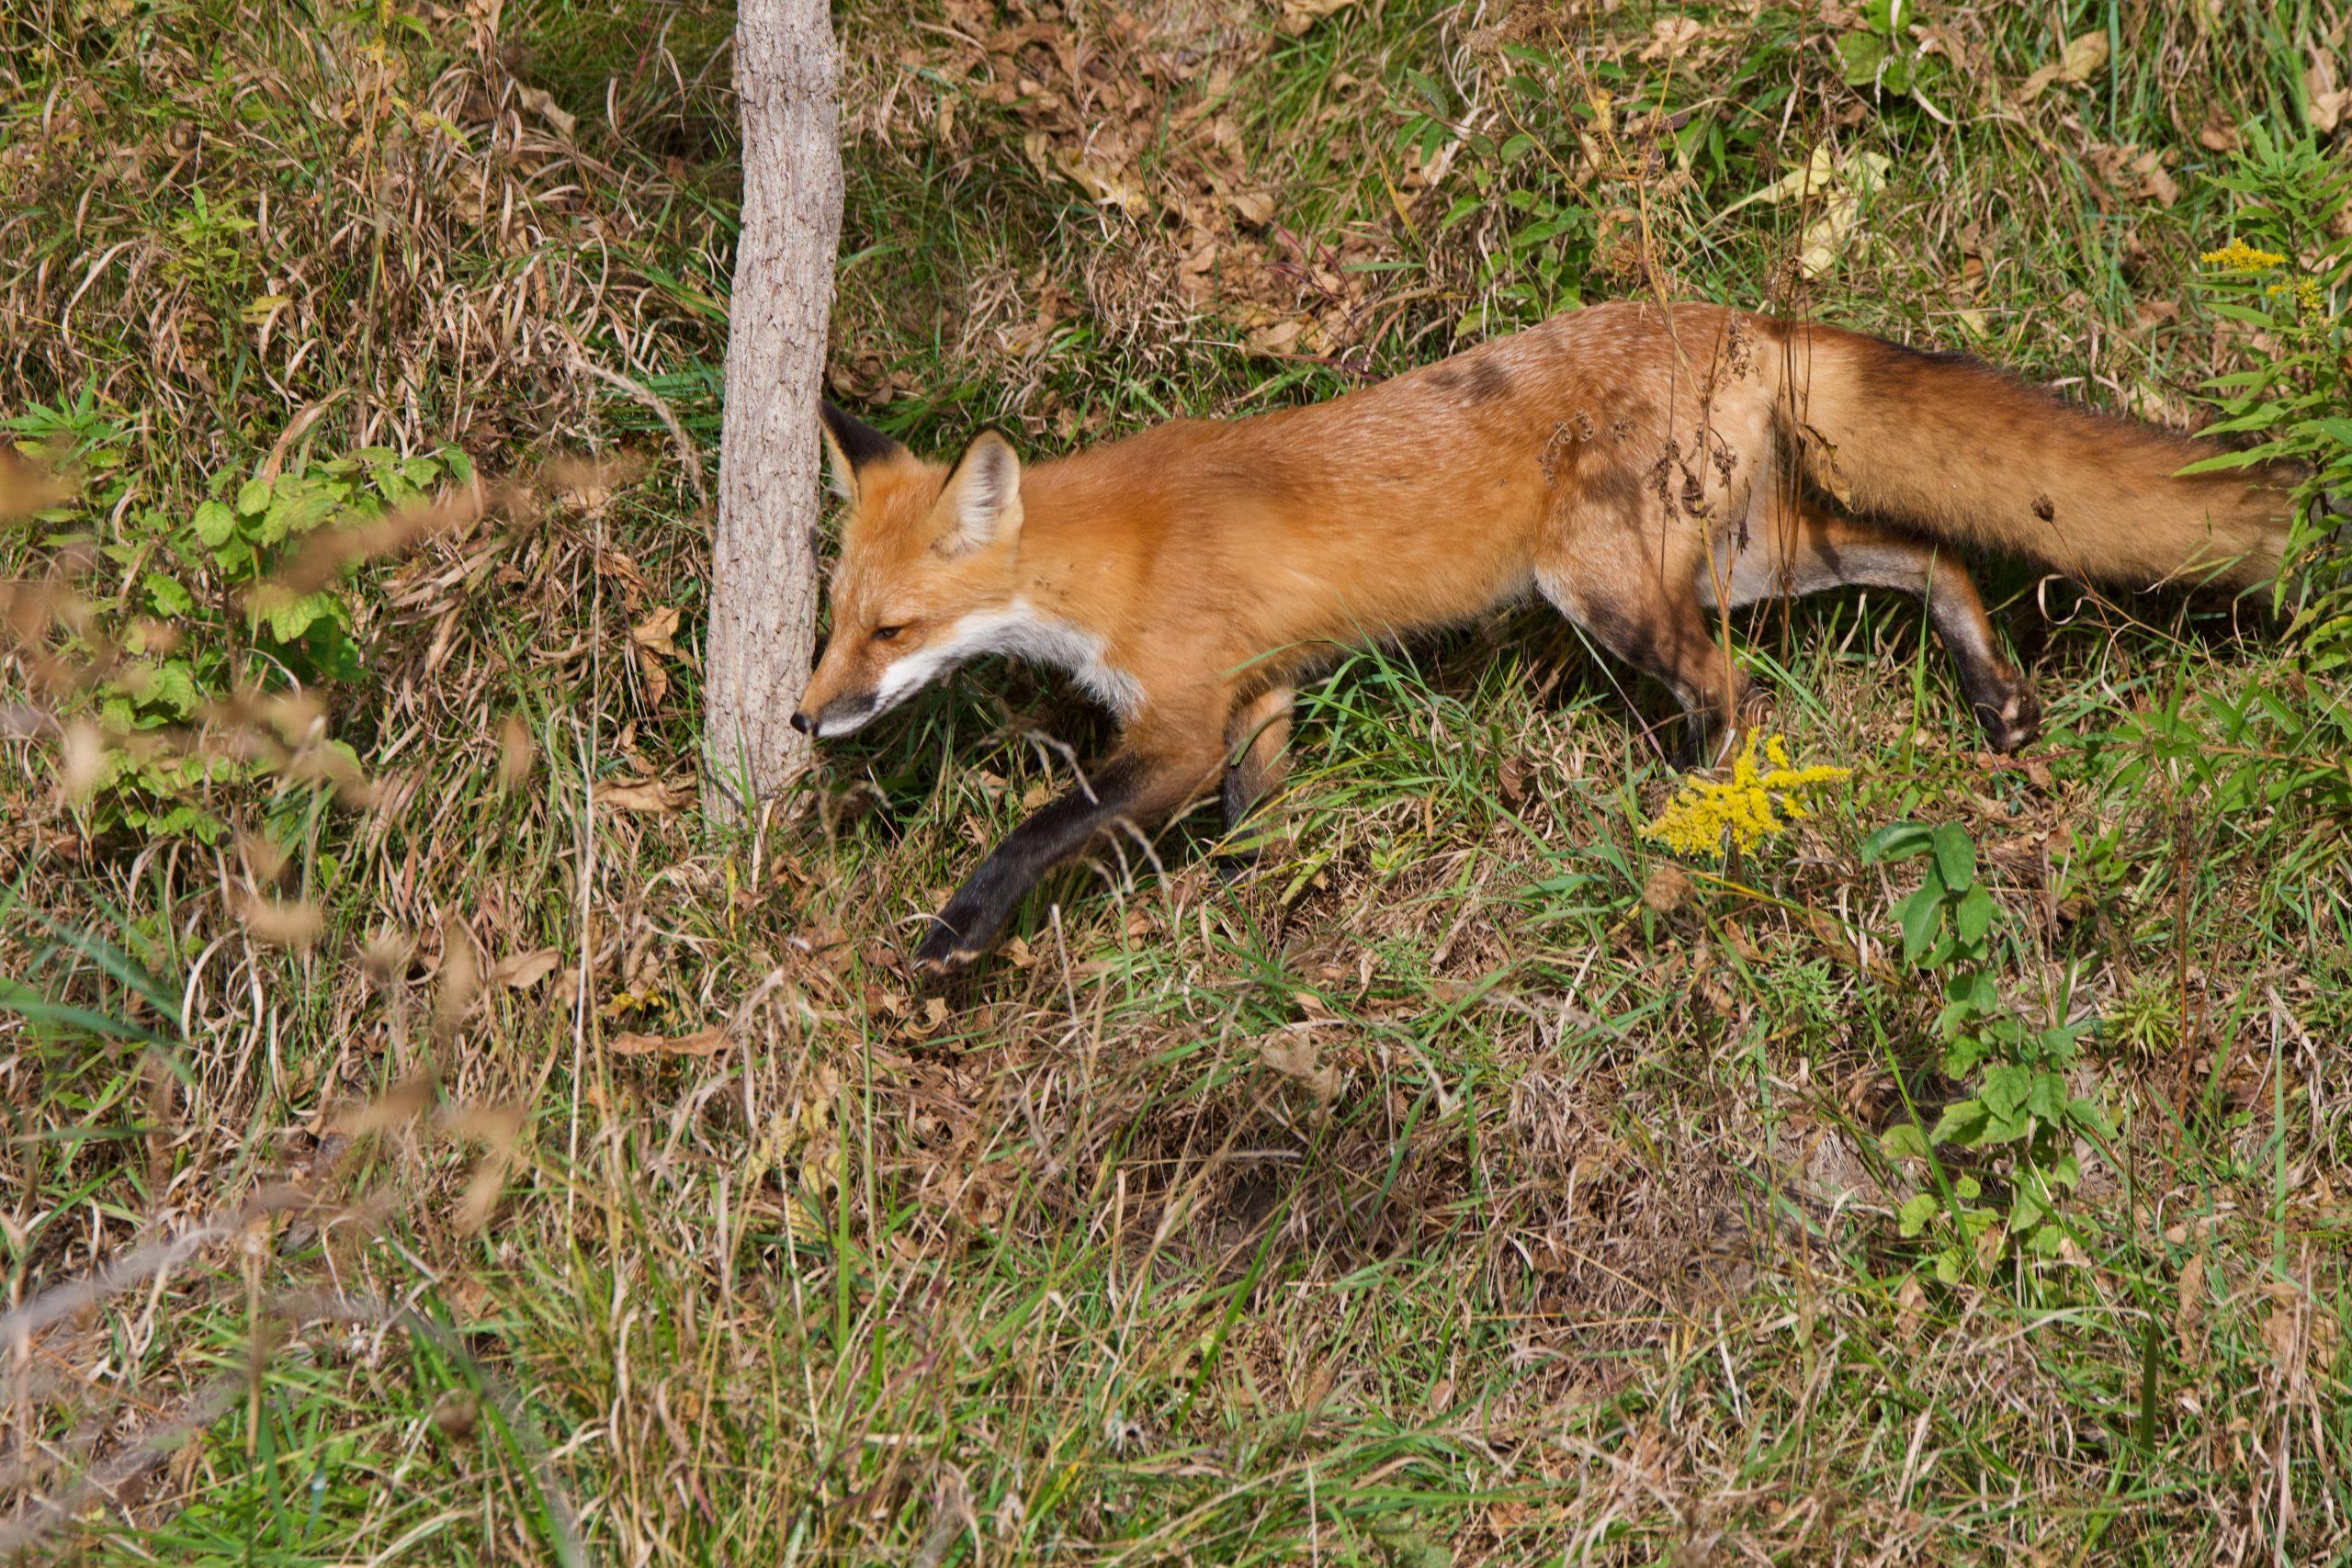 Red Fox Encounters